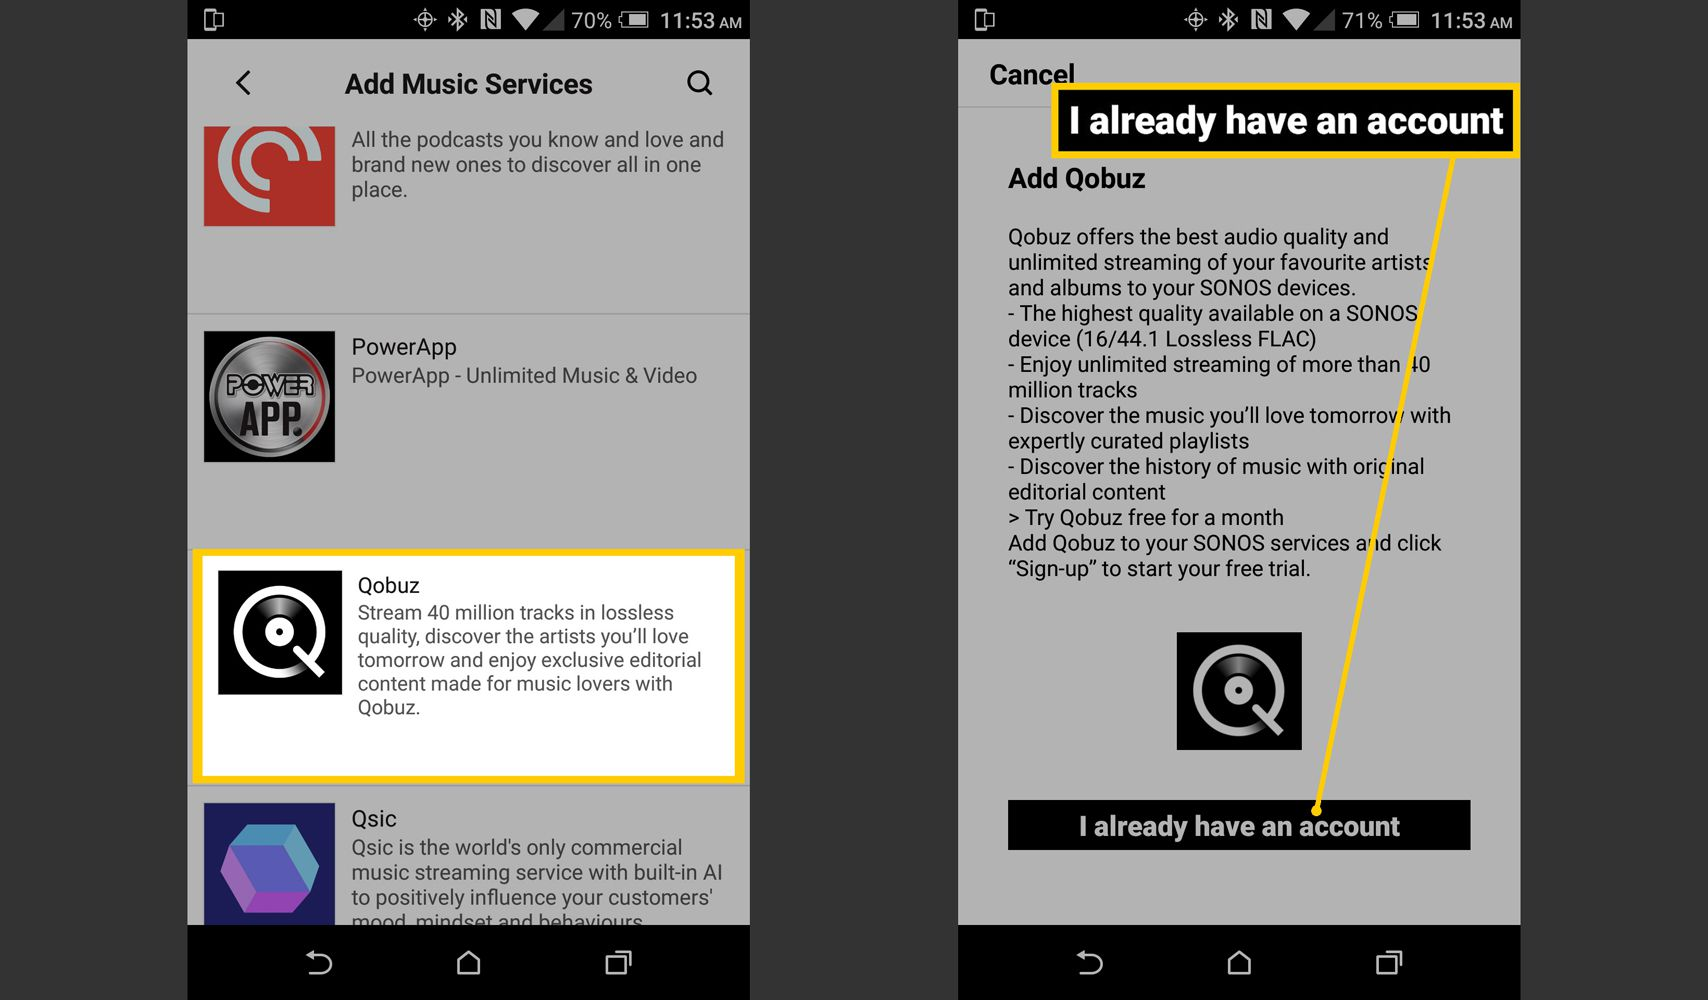 Sonos App – Select and Add Qobuz